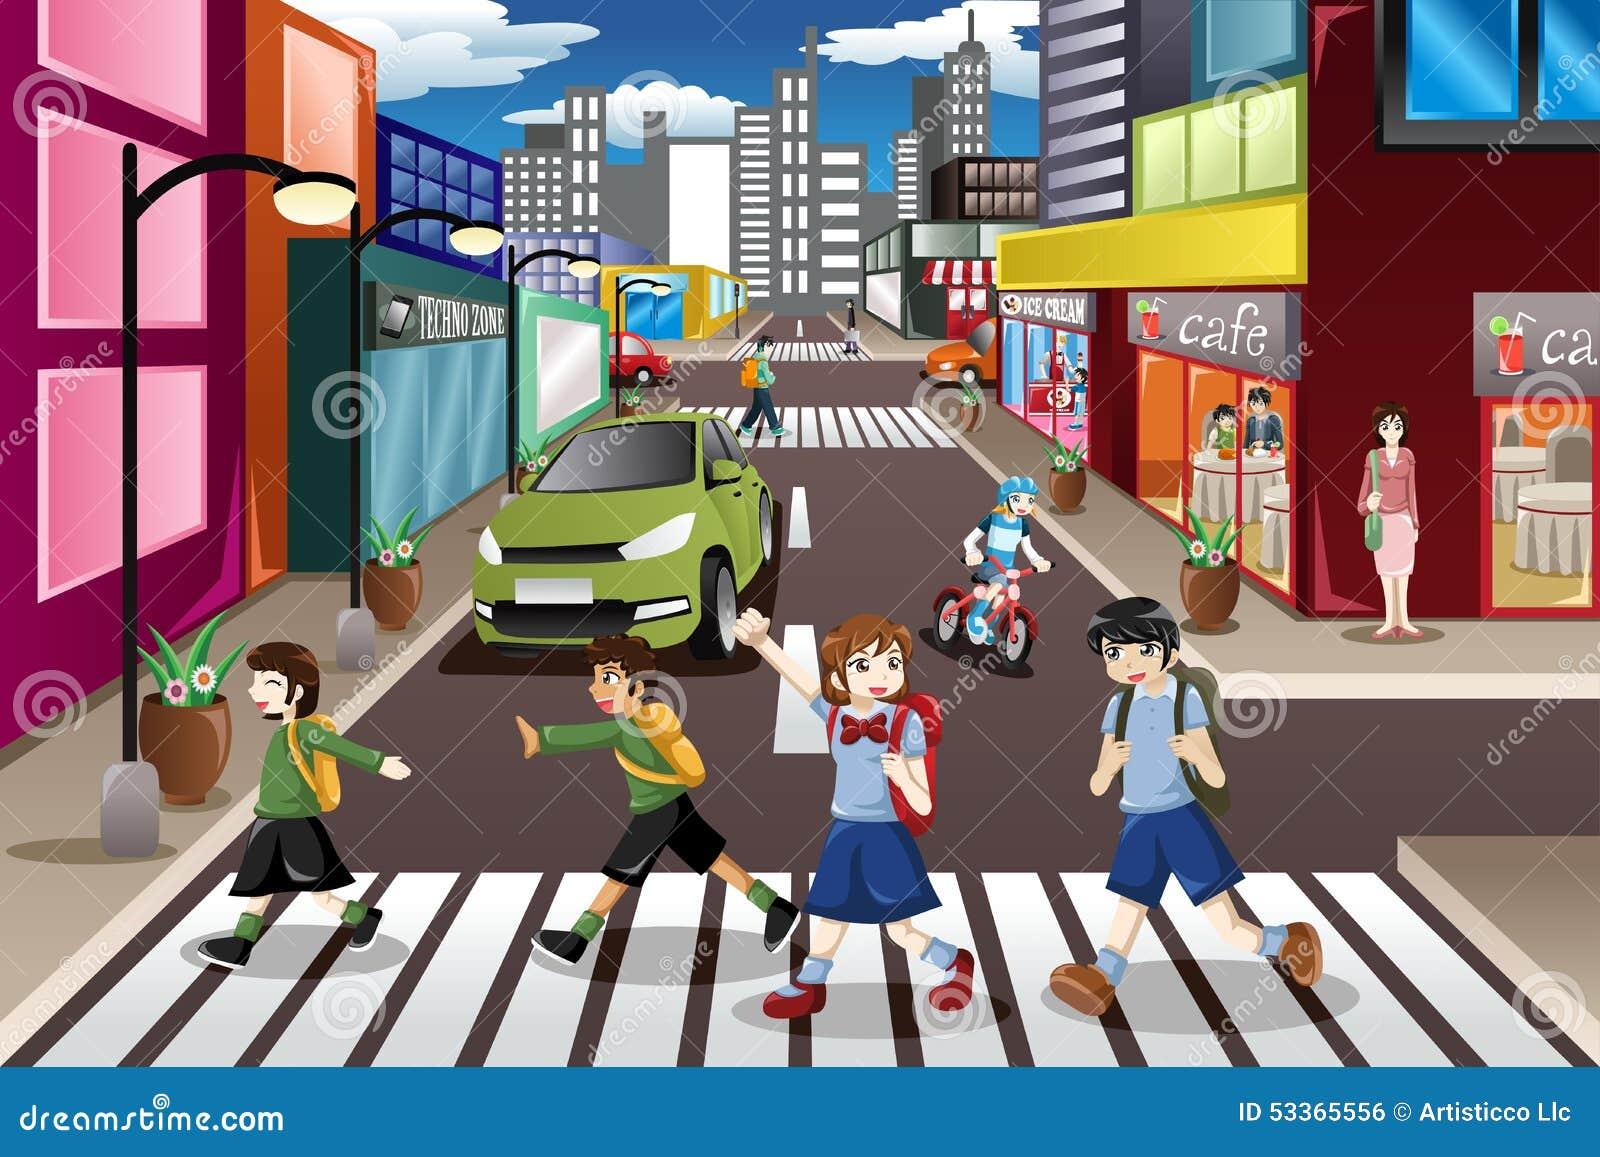 Kids Crossing The Street Stock Vector Illustration Of Childhood